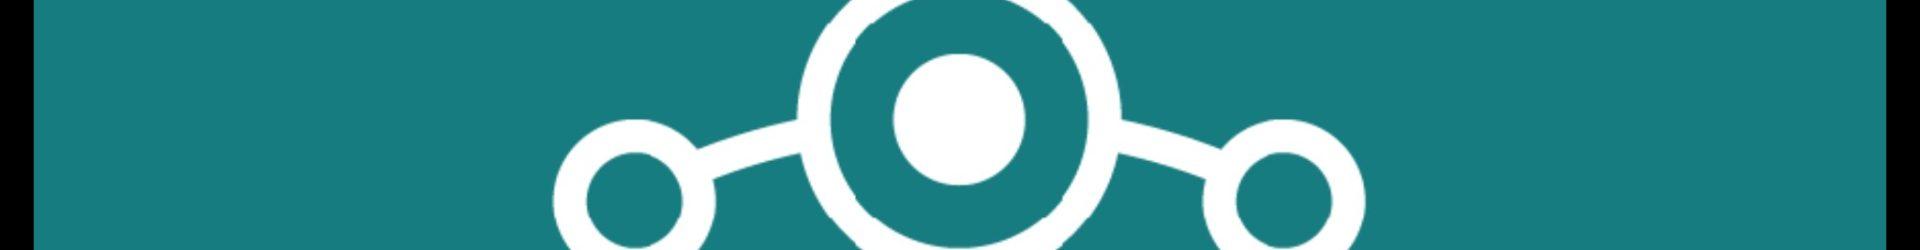 Custom ROM alternative alla CyanogenMod. Ma le Custom ROM hanno ancora senso?